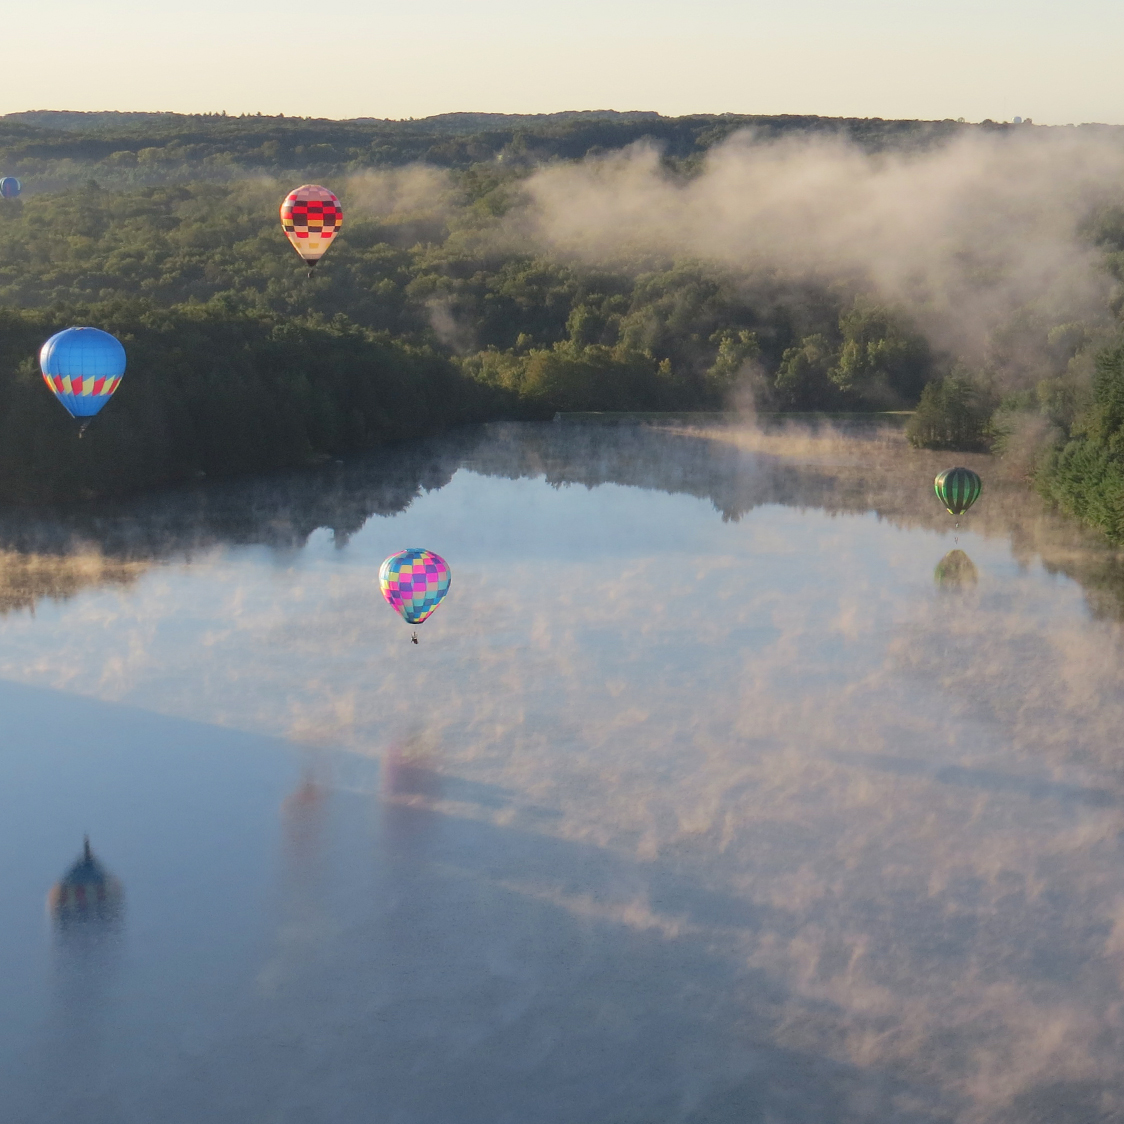 hot_air_balloon_misty_morning.jpg